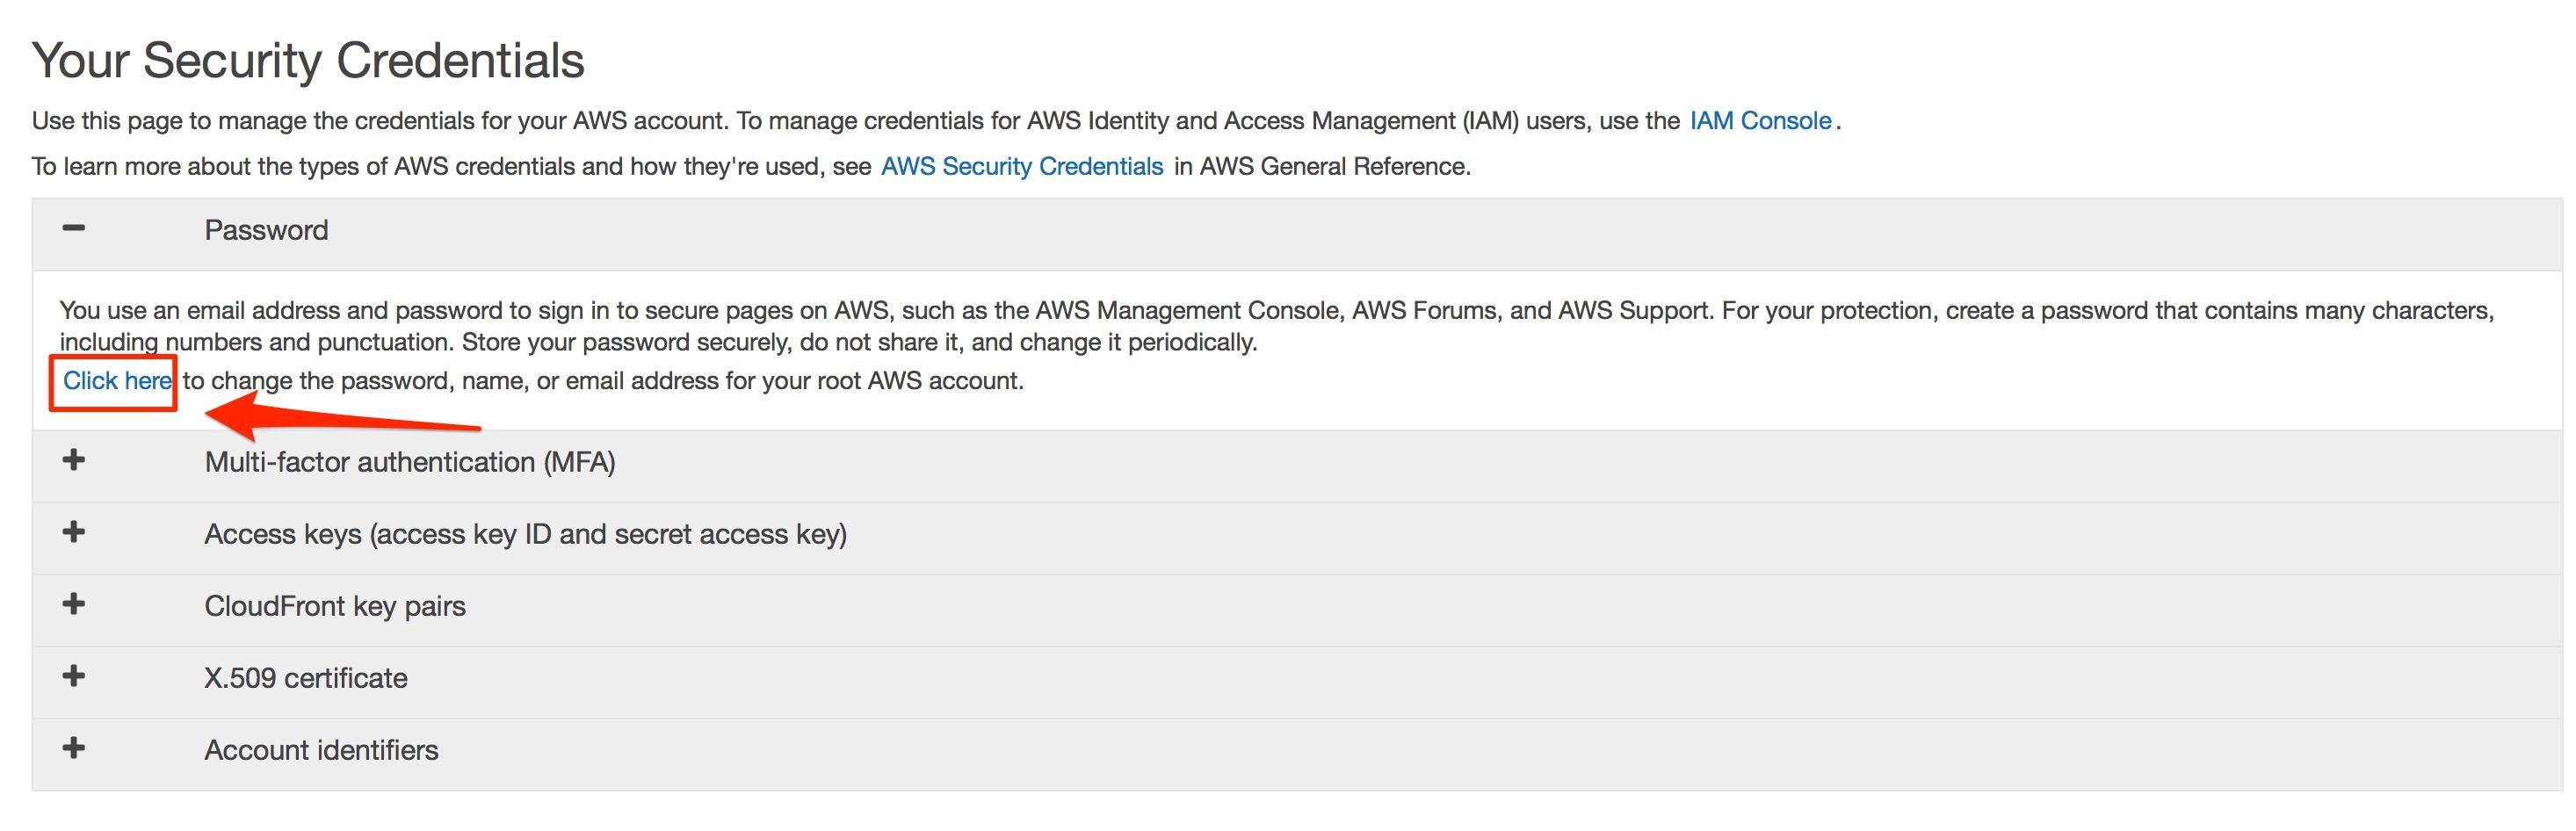 aws management console - thay đổi mật khẩu aws account 2